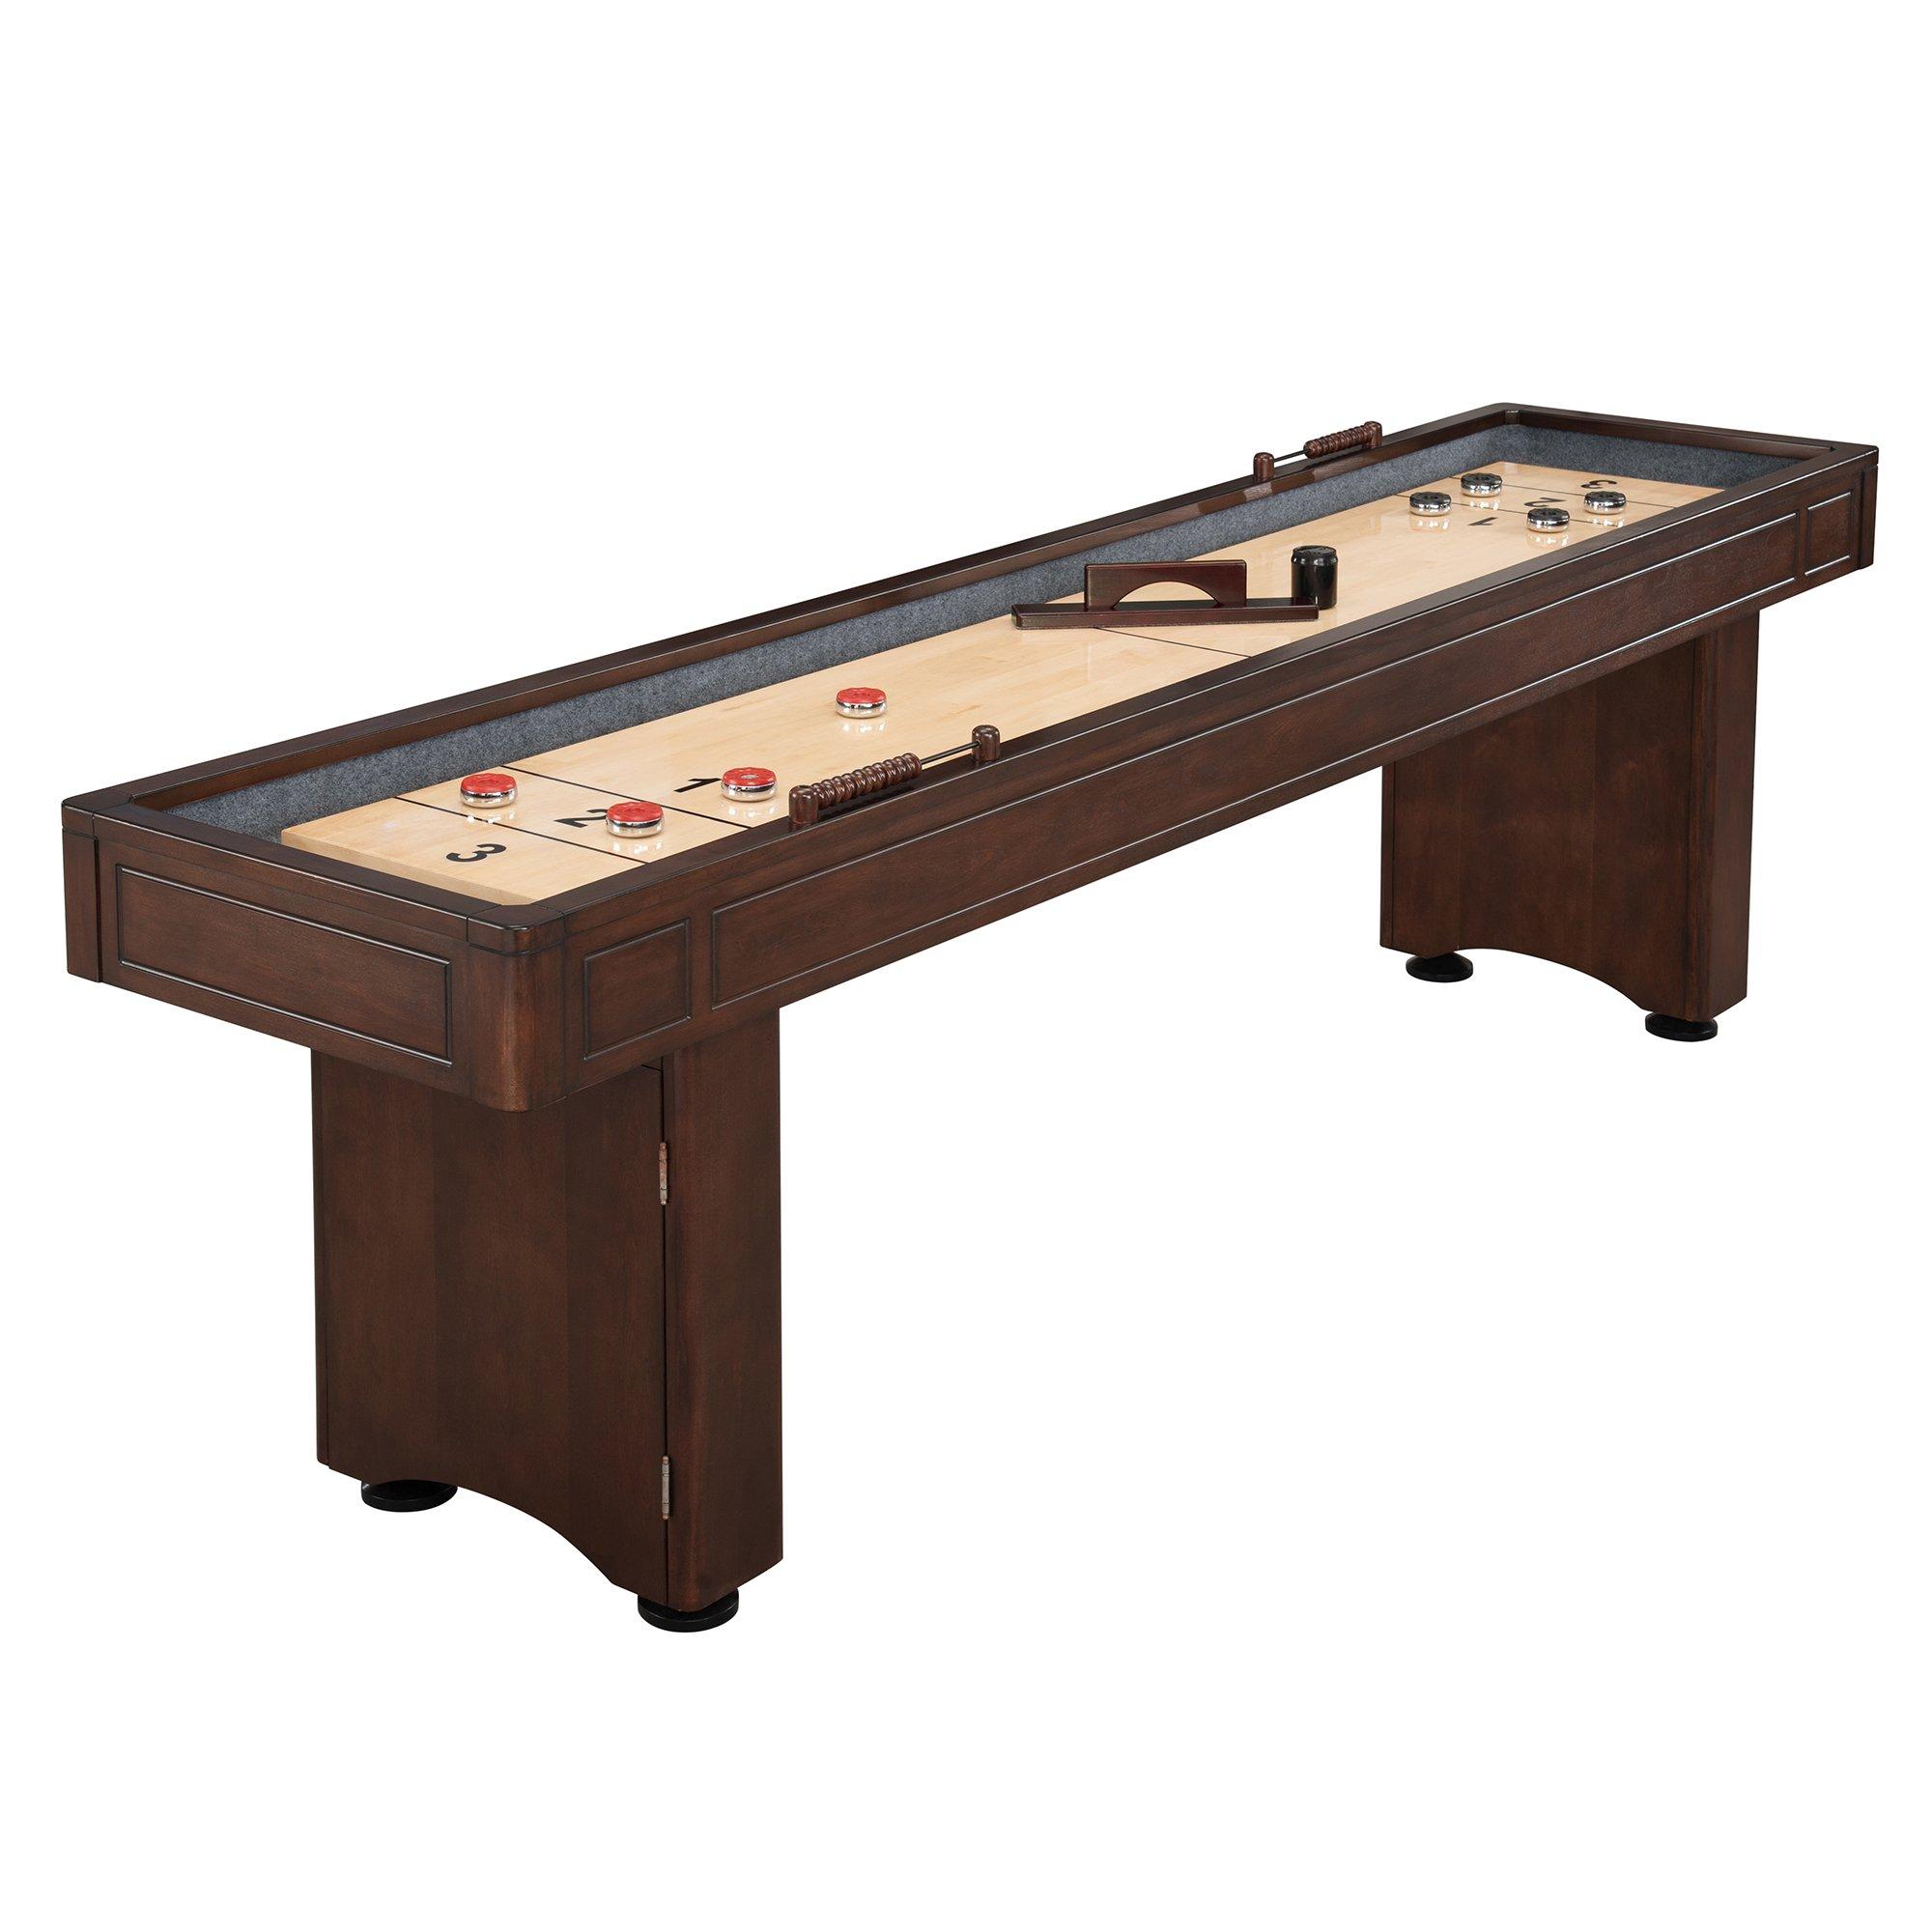 Hathaway Austin 9' Shuffleboard Table by Hathaway